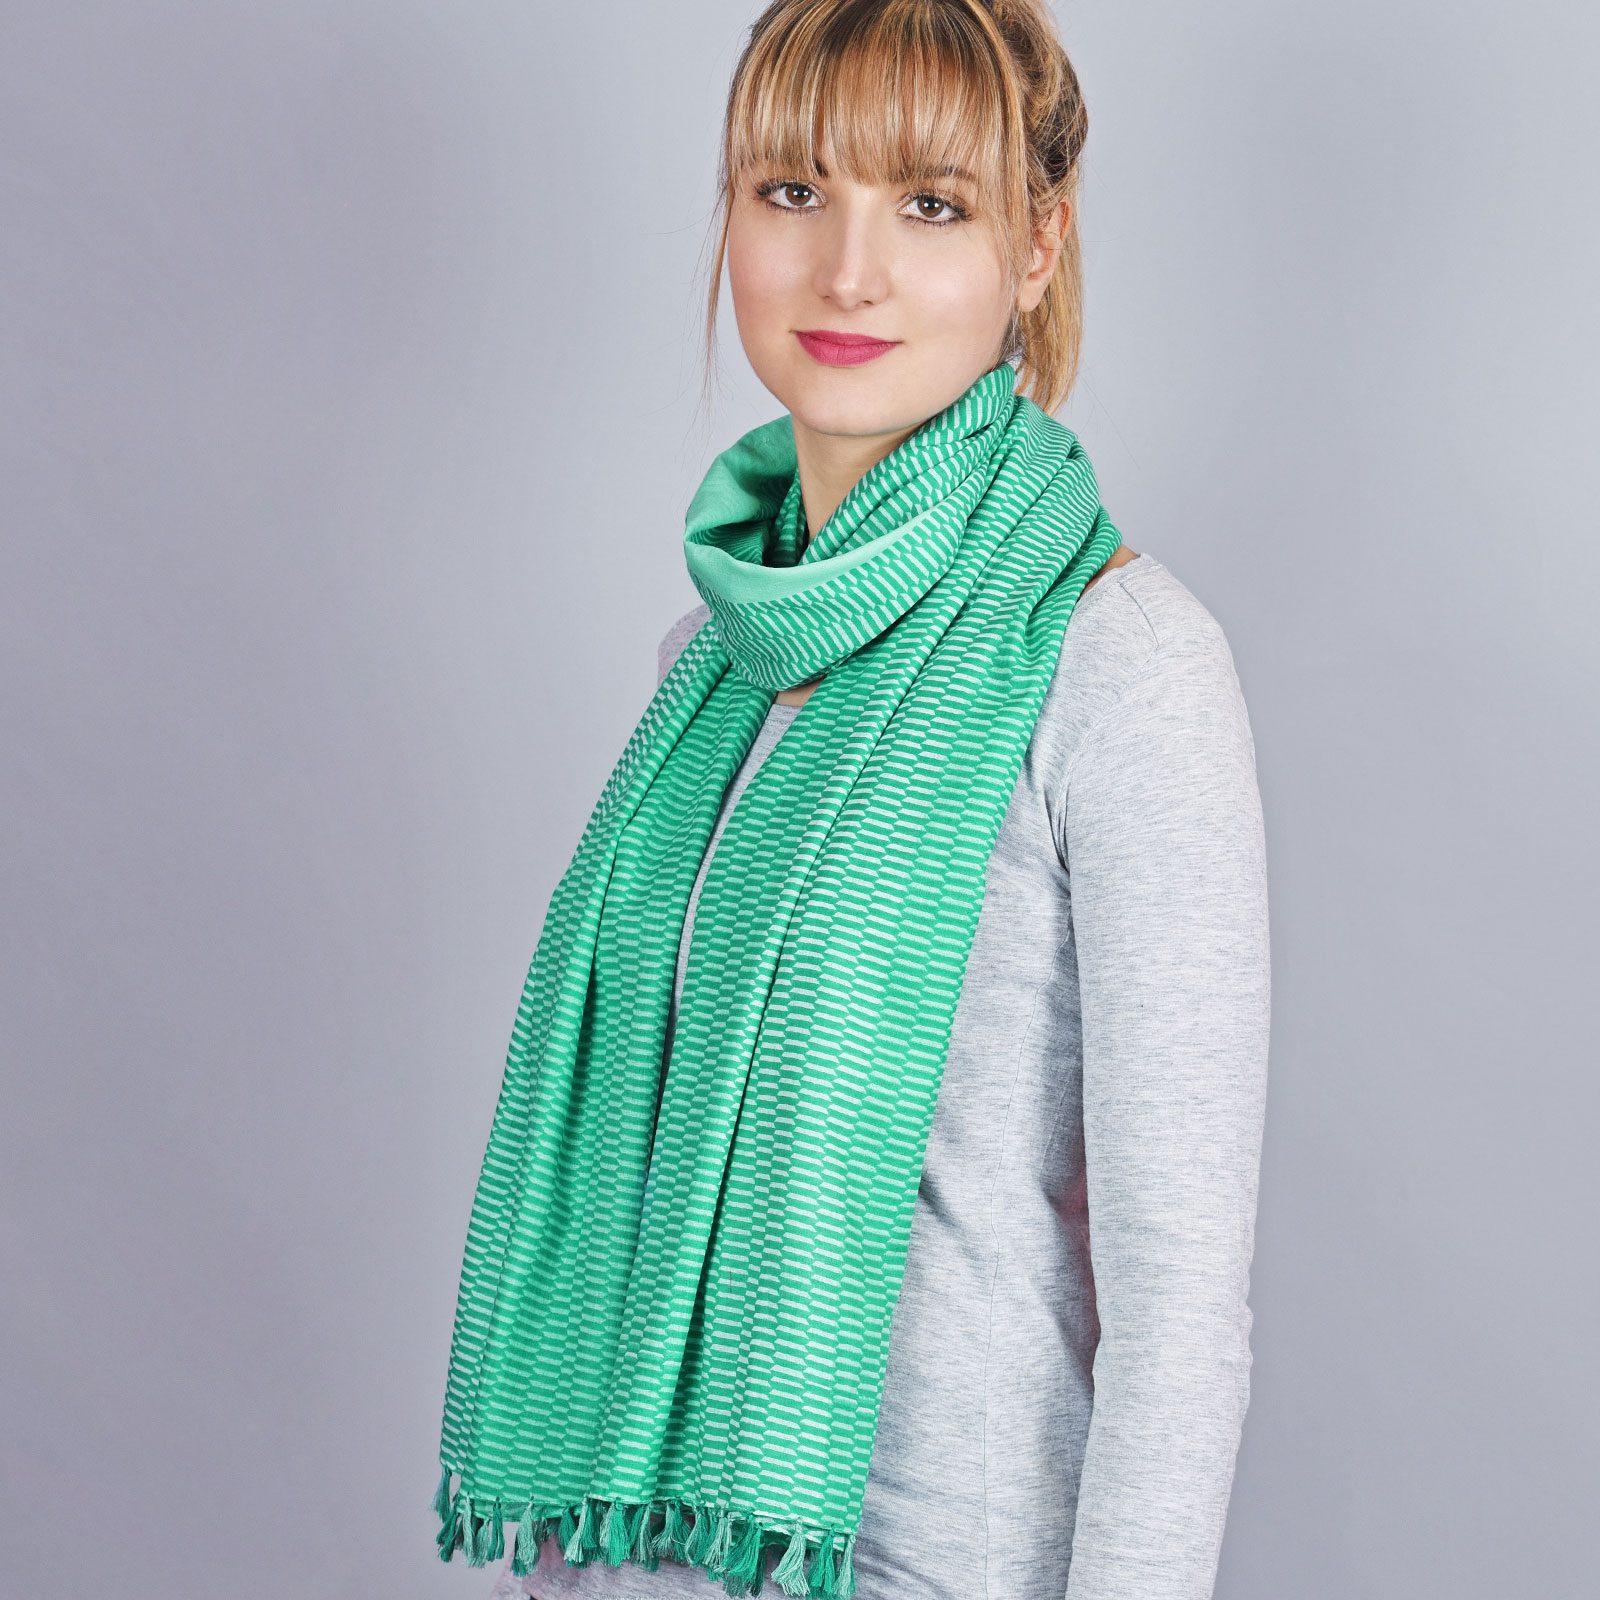 http://lookbook.allee-du-foulard.fr/wp-content/uploads/2018/06/AT-04345-VF16-1-cheche-pompon-rayures-vert-menthe-1600x1600.jpg